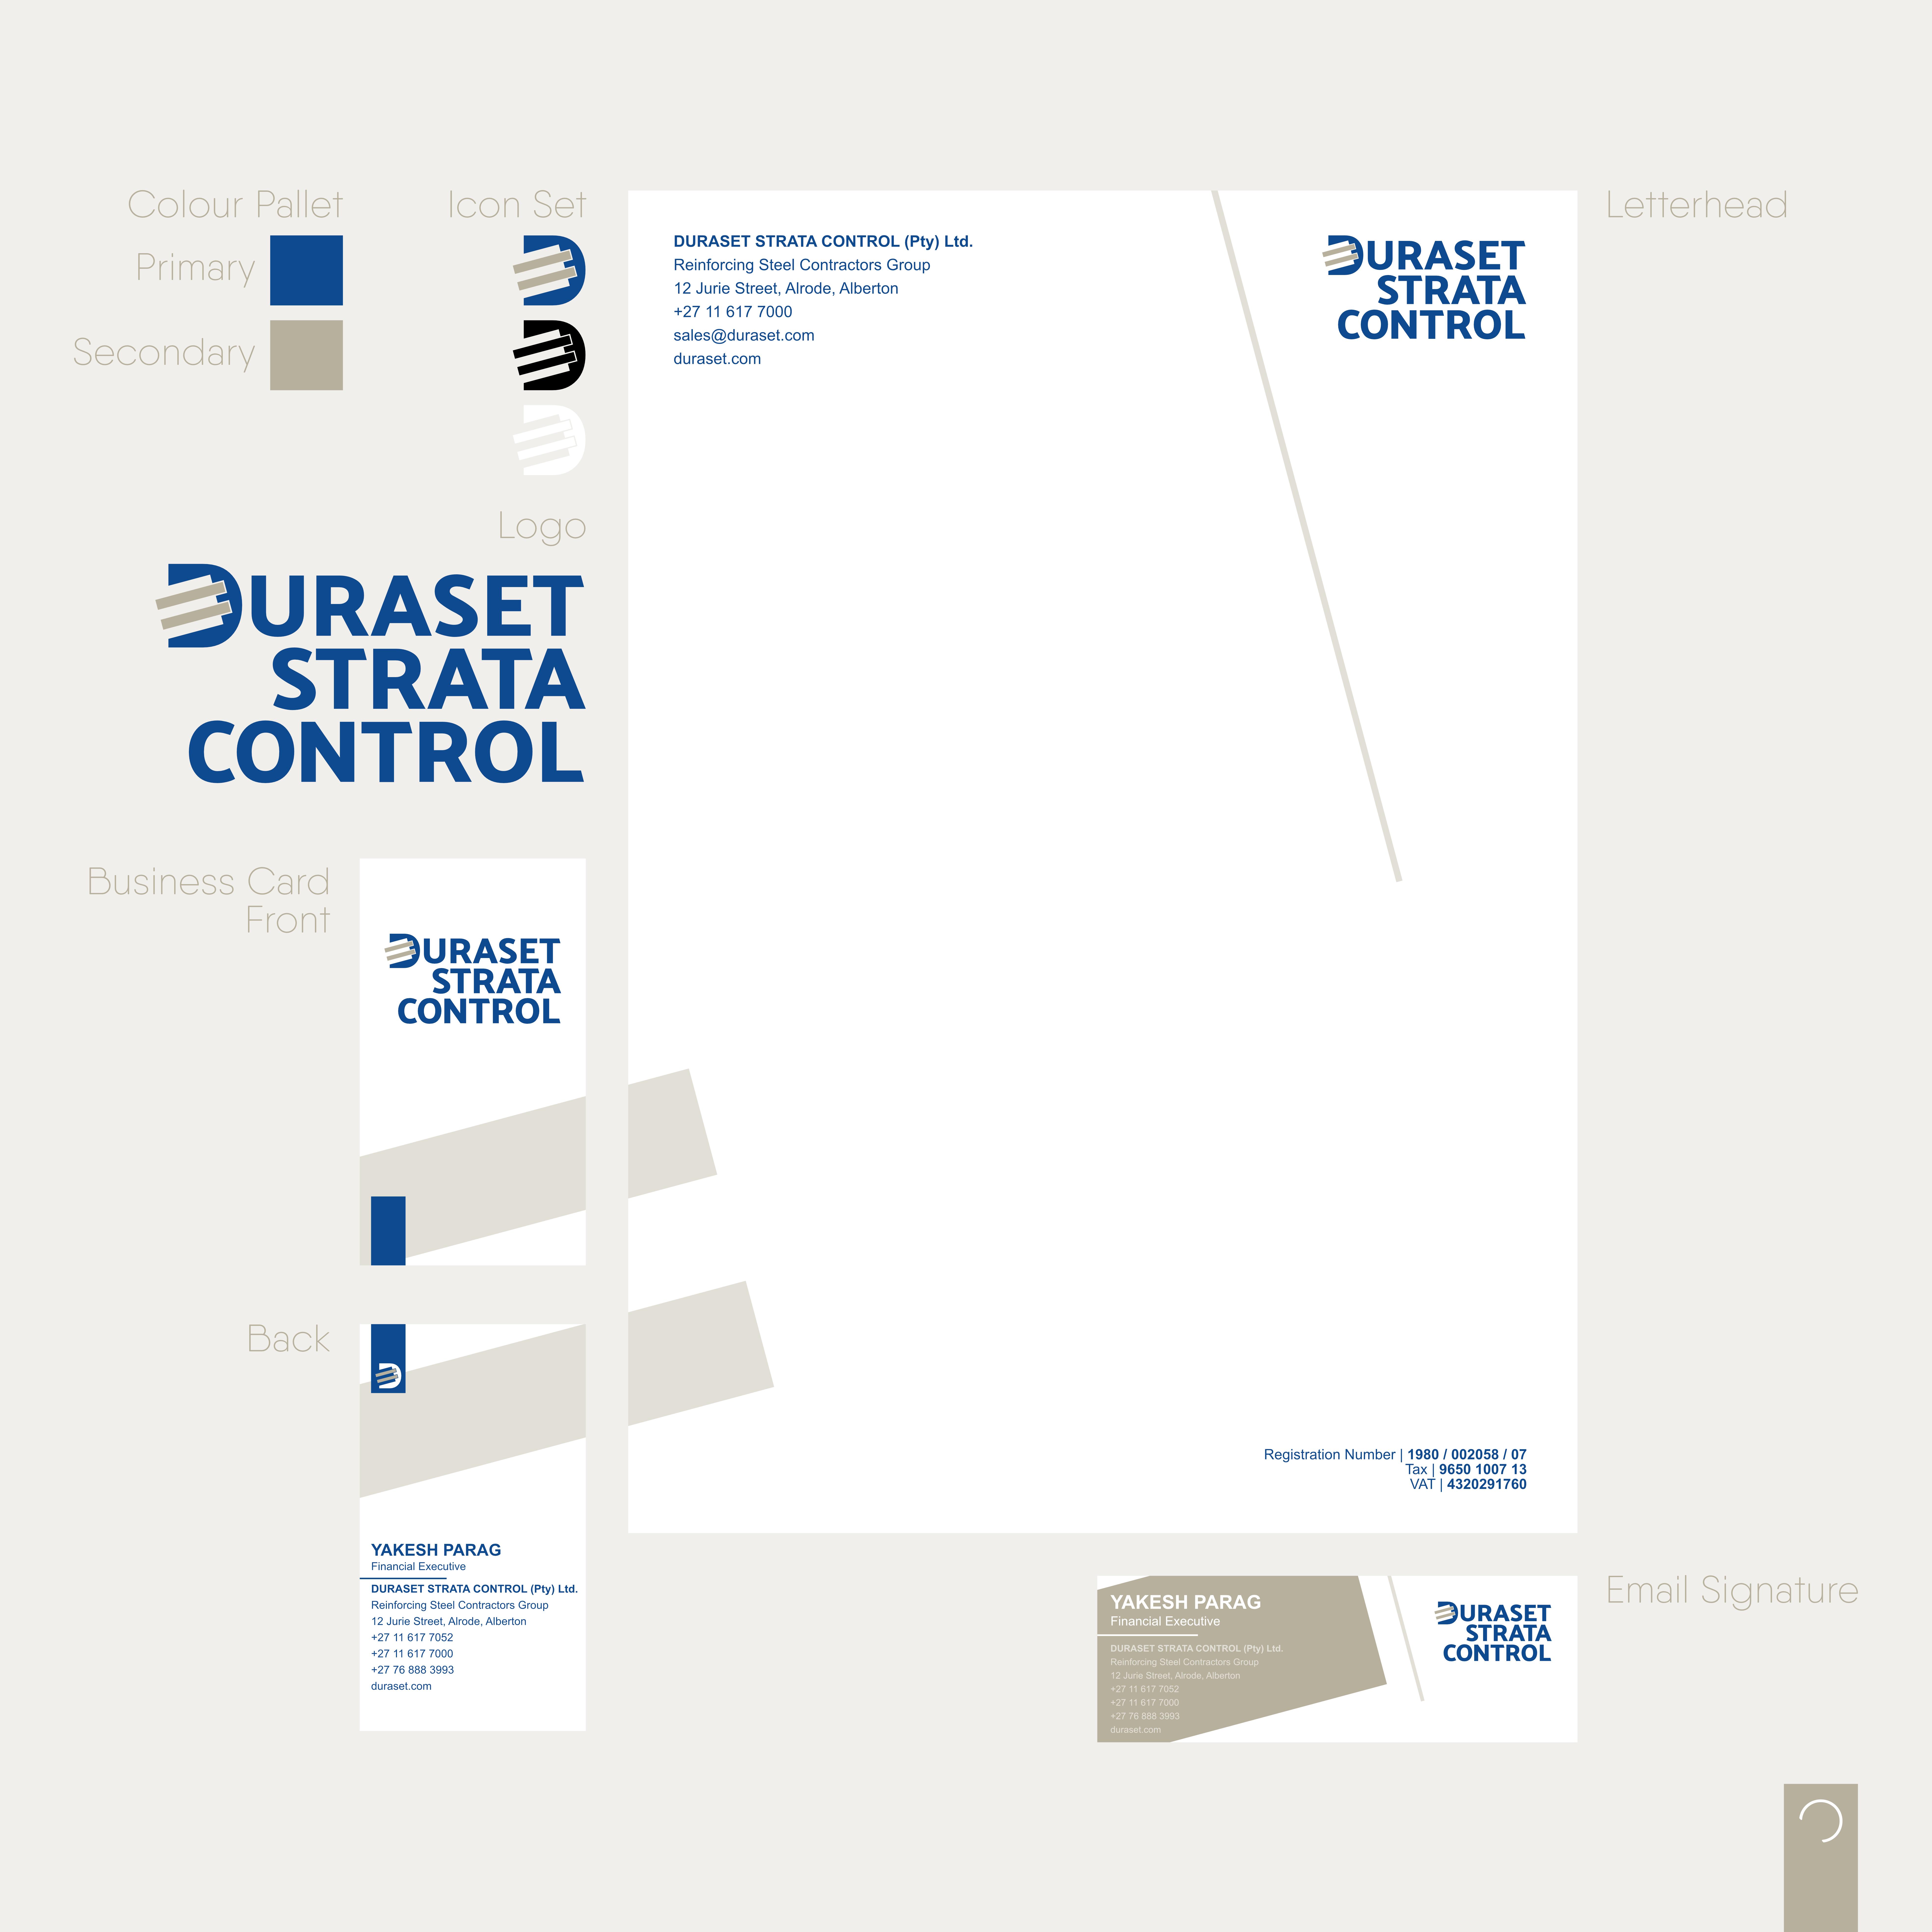 Duraset Strata Control – Corporate Identaty